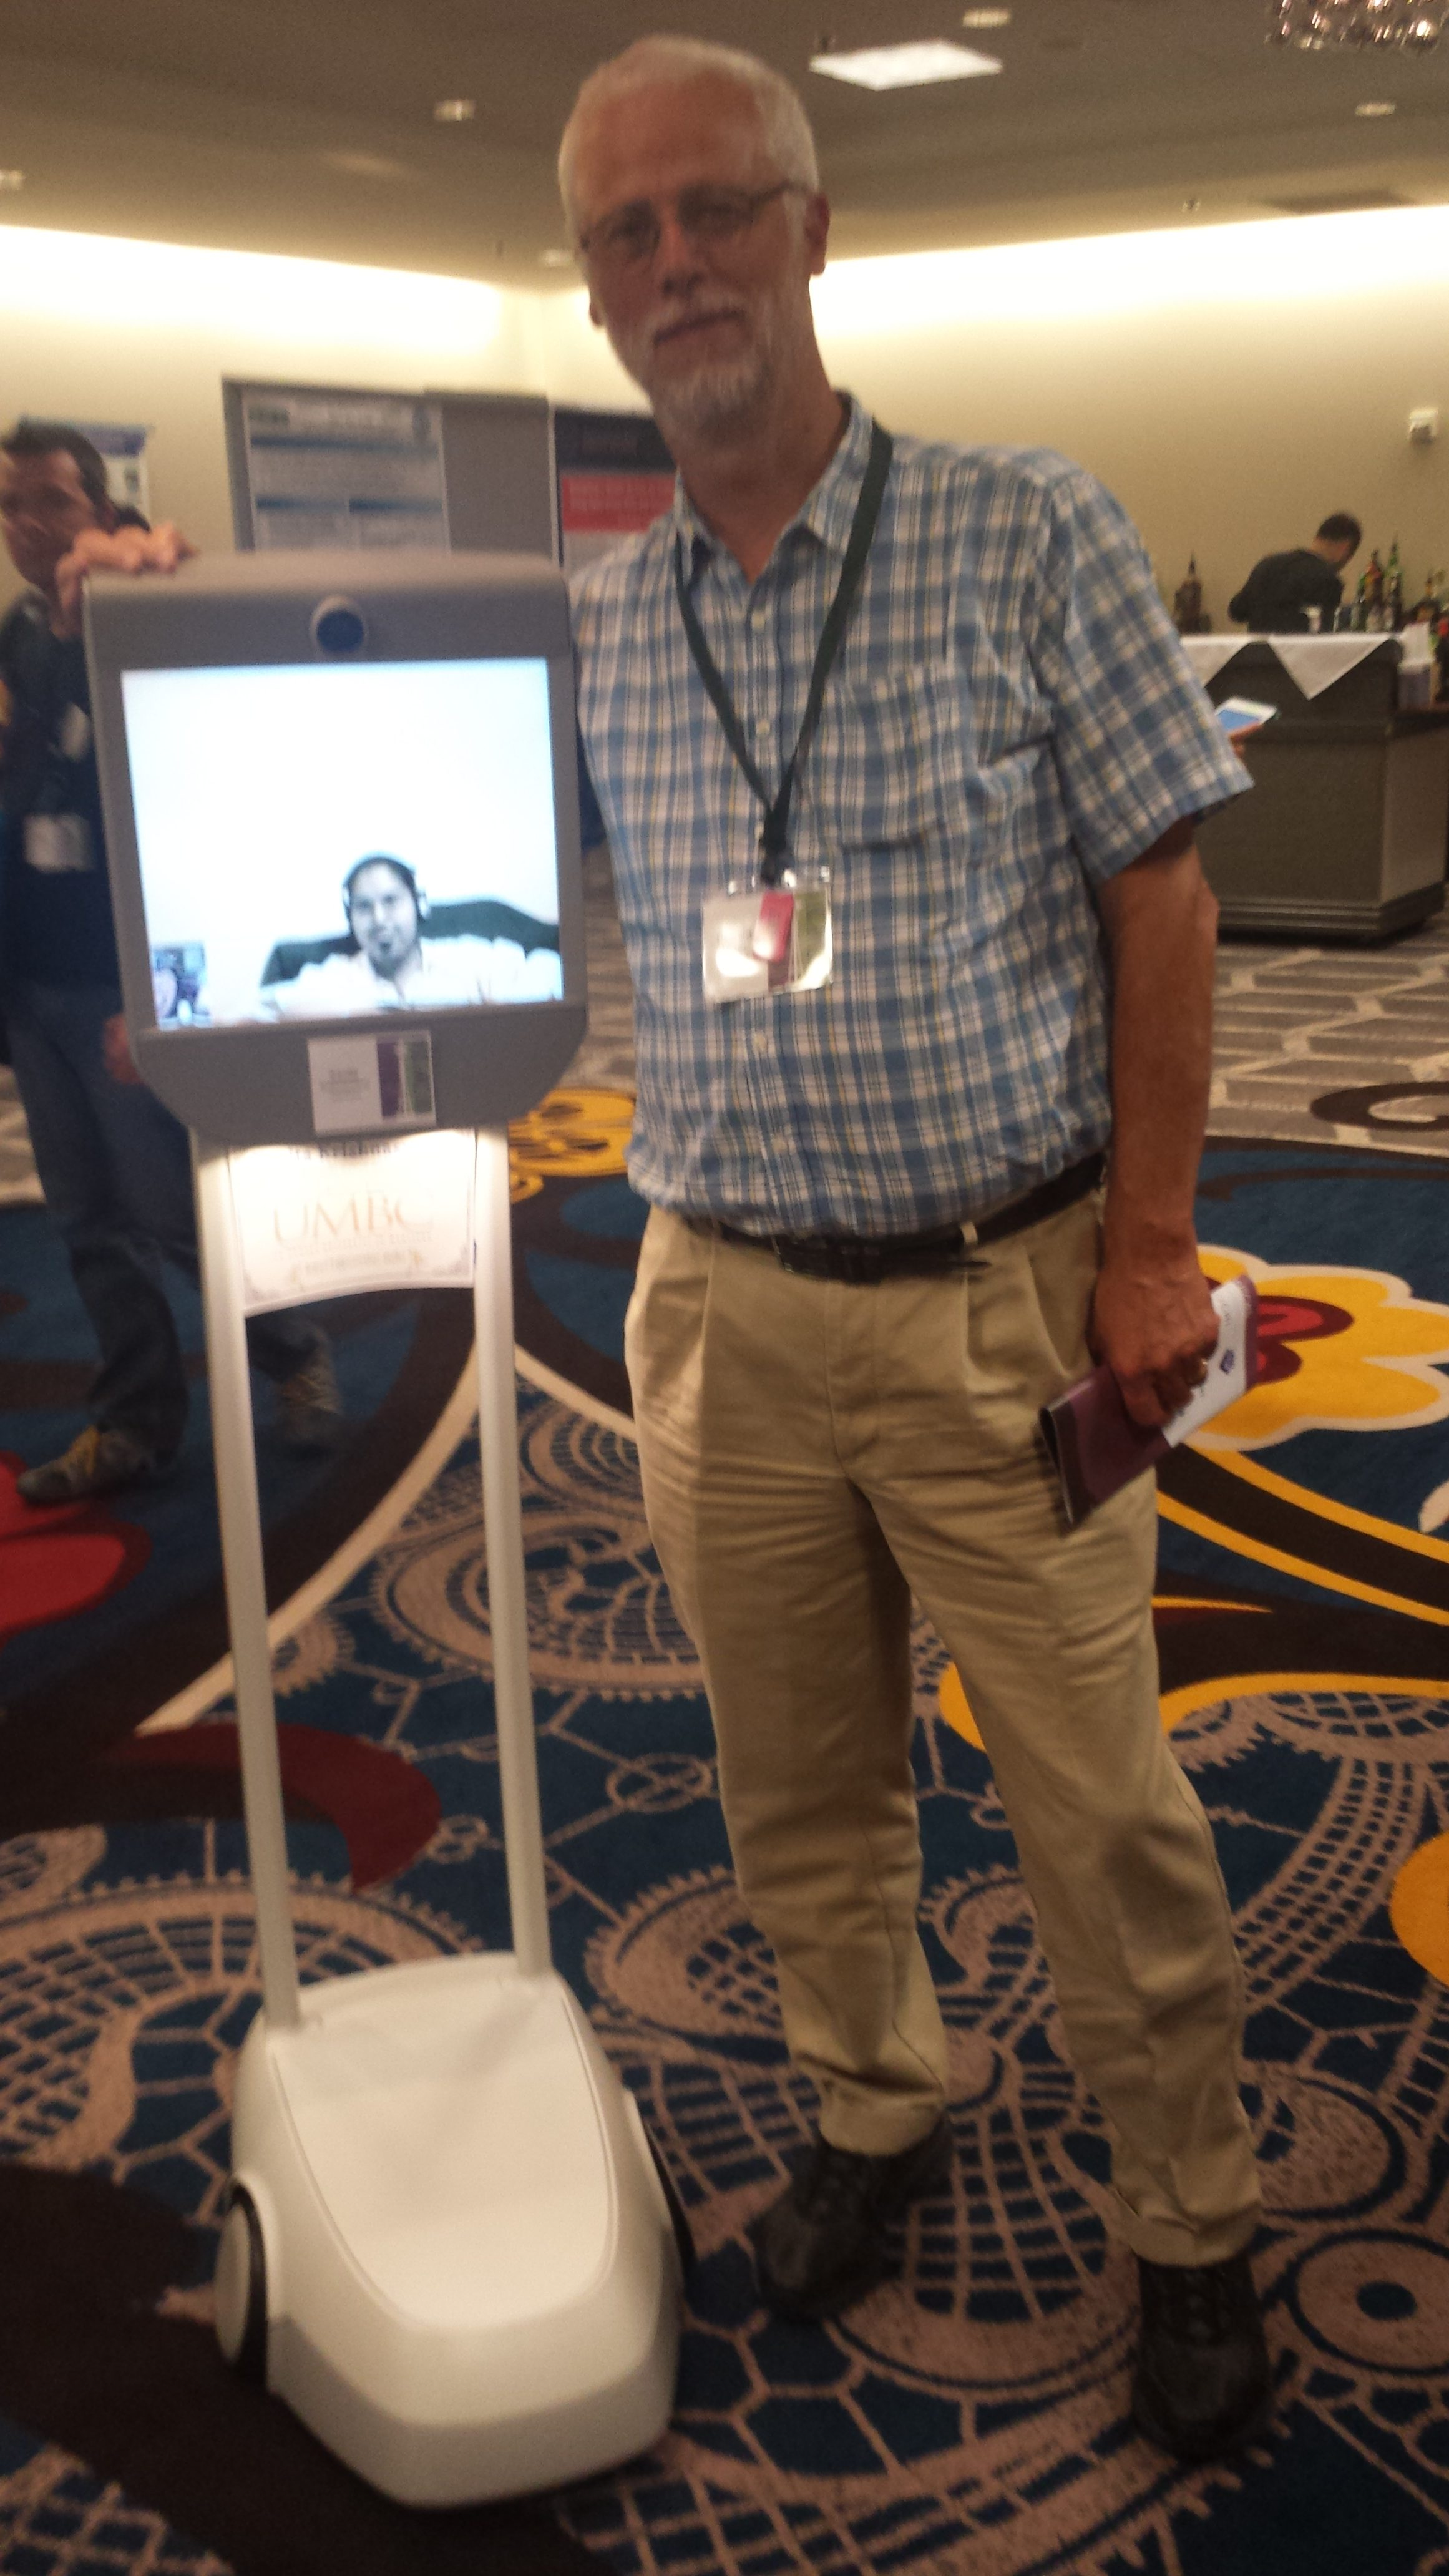 Kavita's telepresence robot with RIchard Ladner